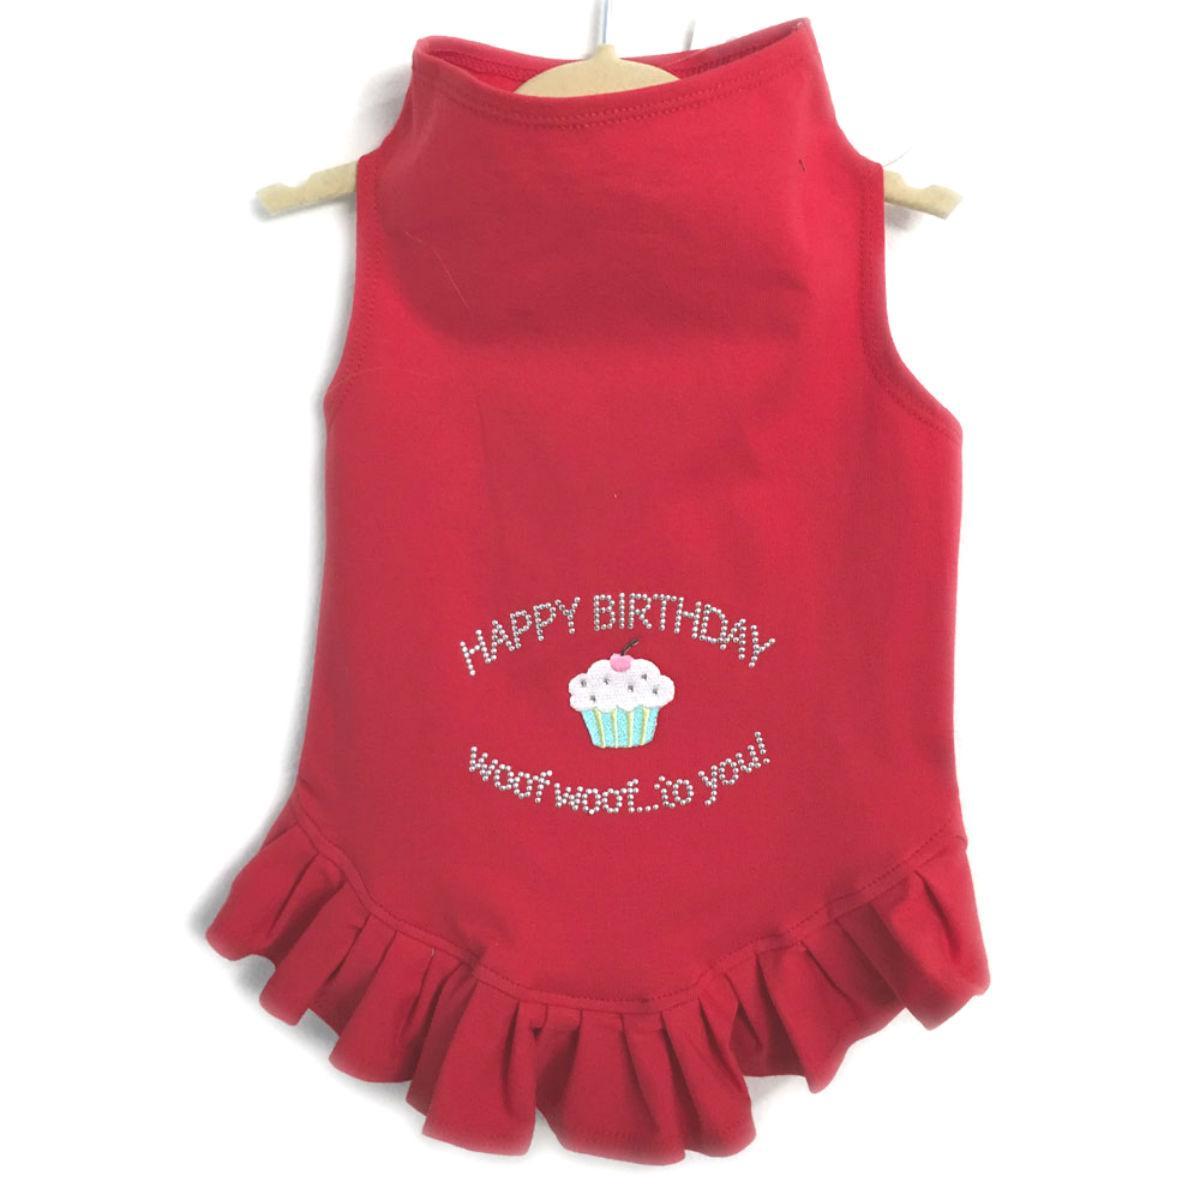 Daisy & Lucy Happy Birthday Dog Dress - Red